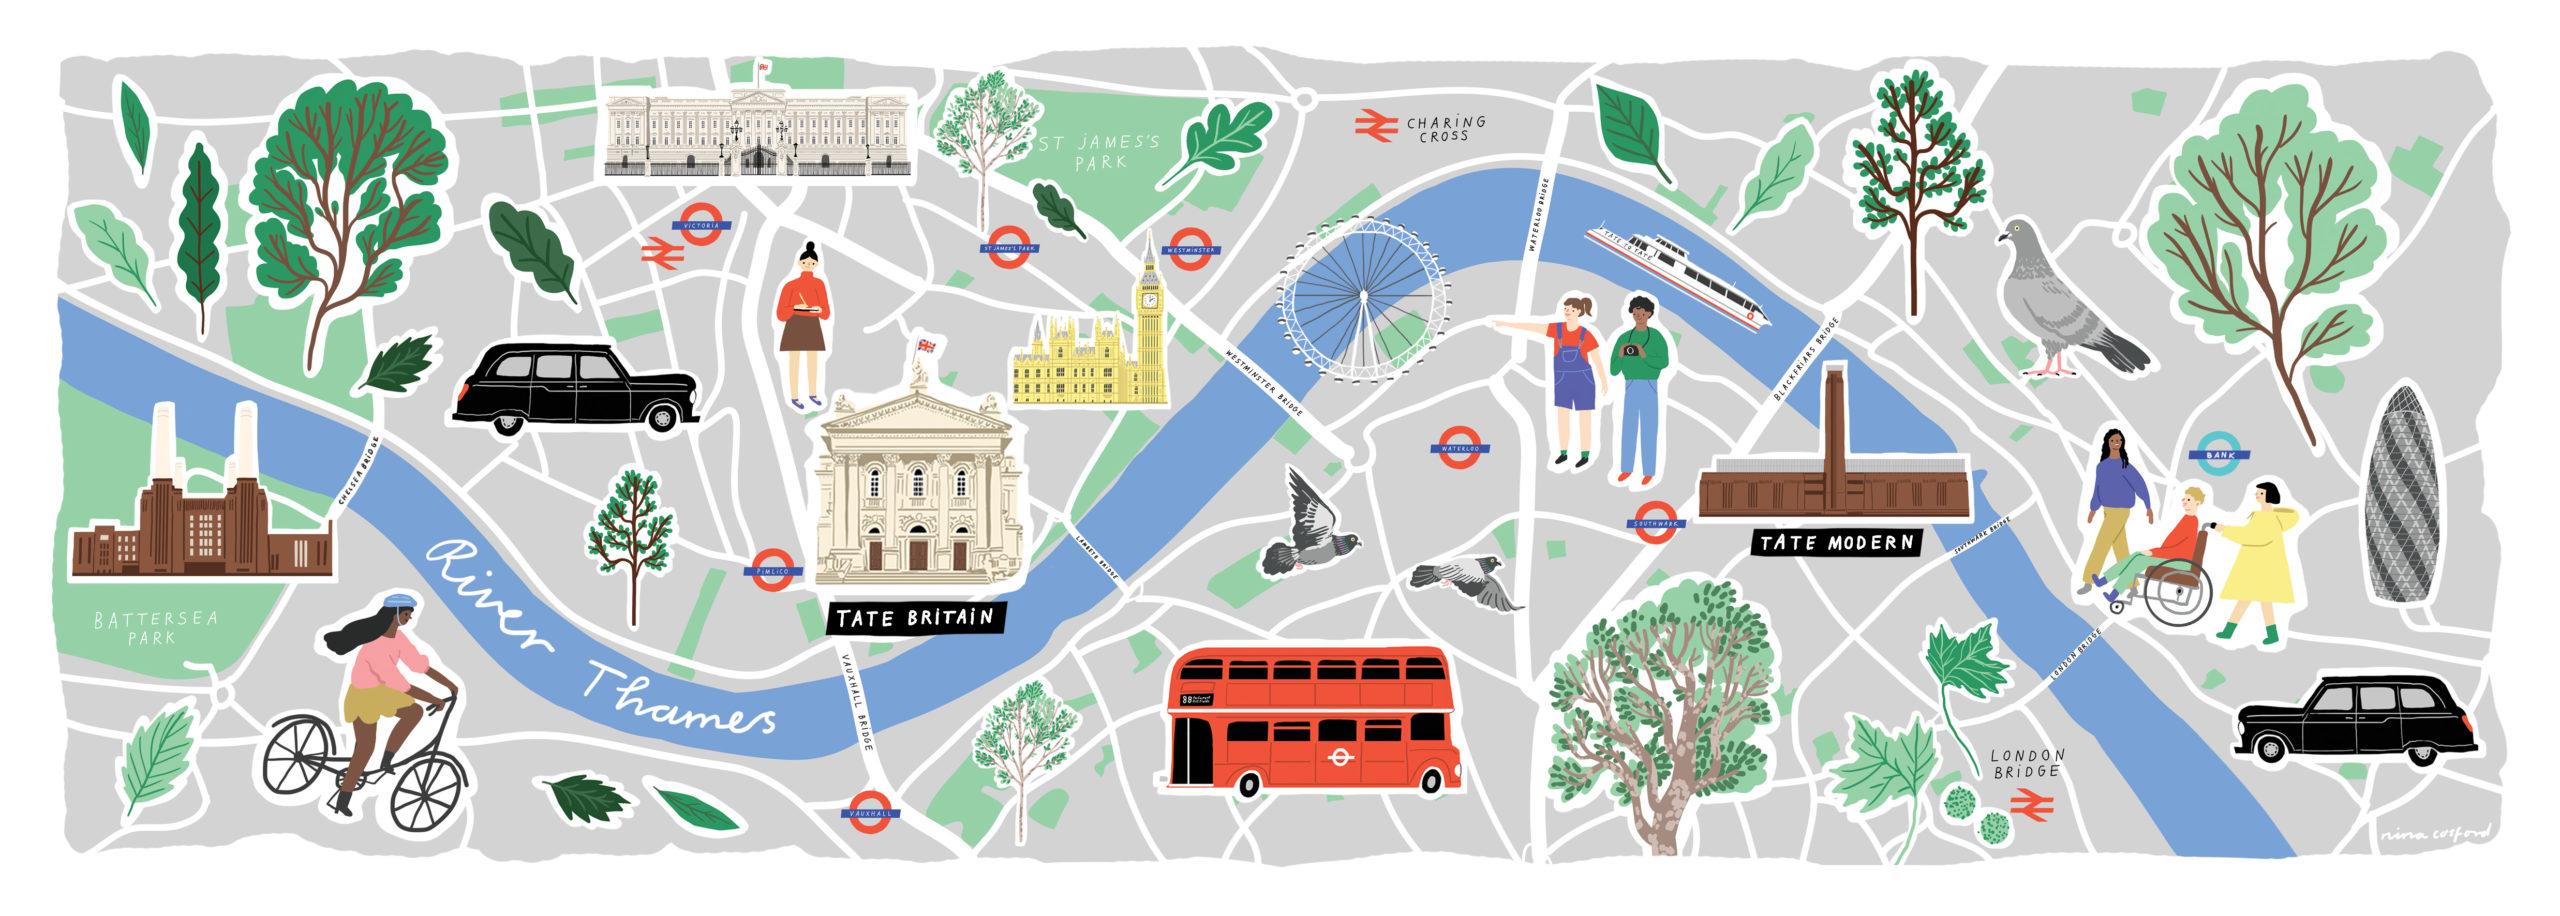 TATE BRITAIN MAP NEW